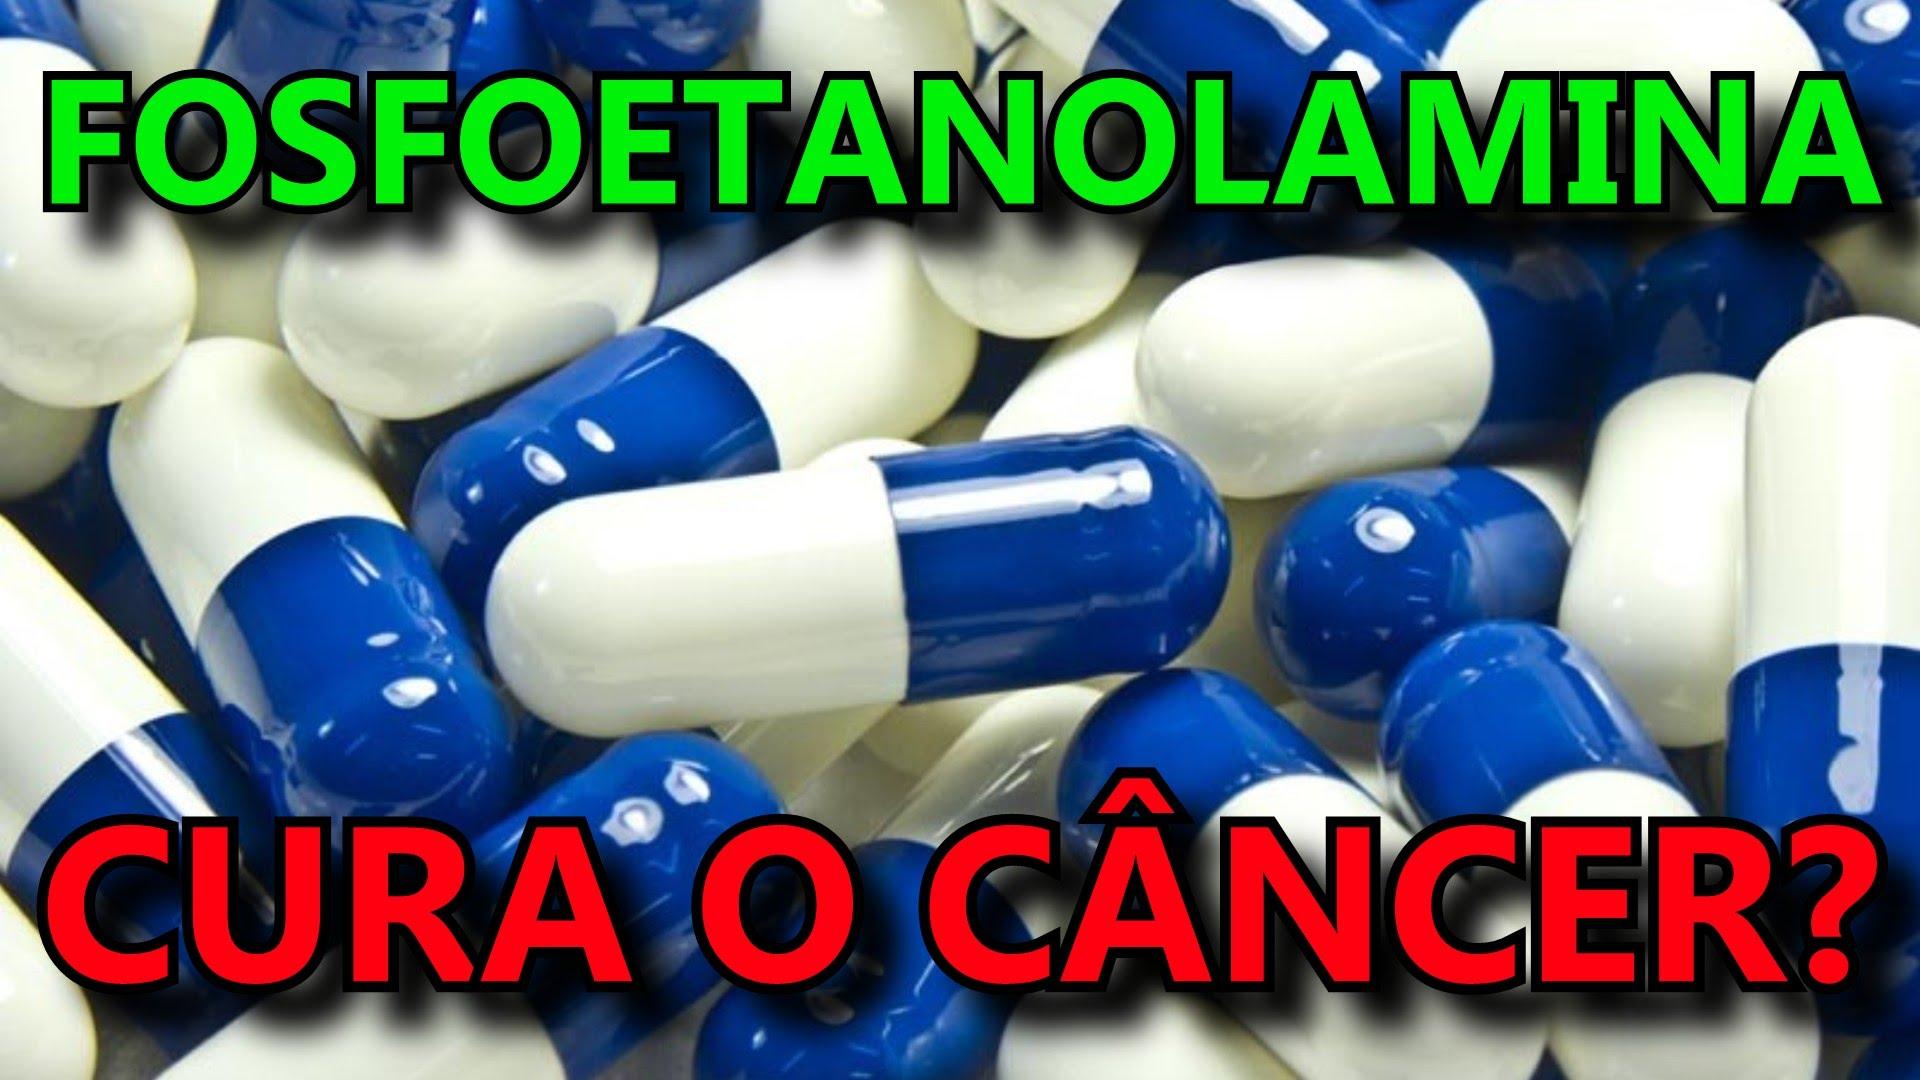 fosfoetalonamina